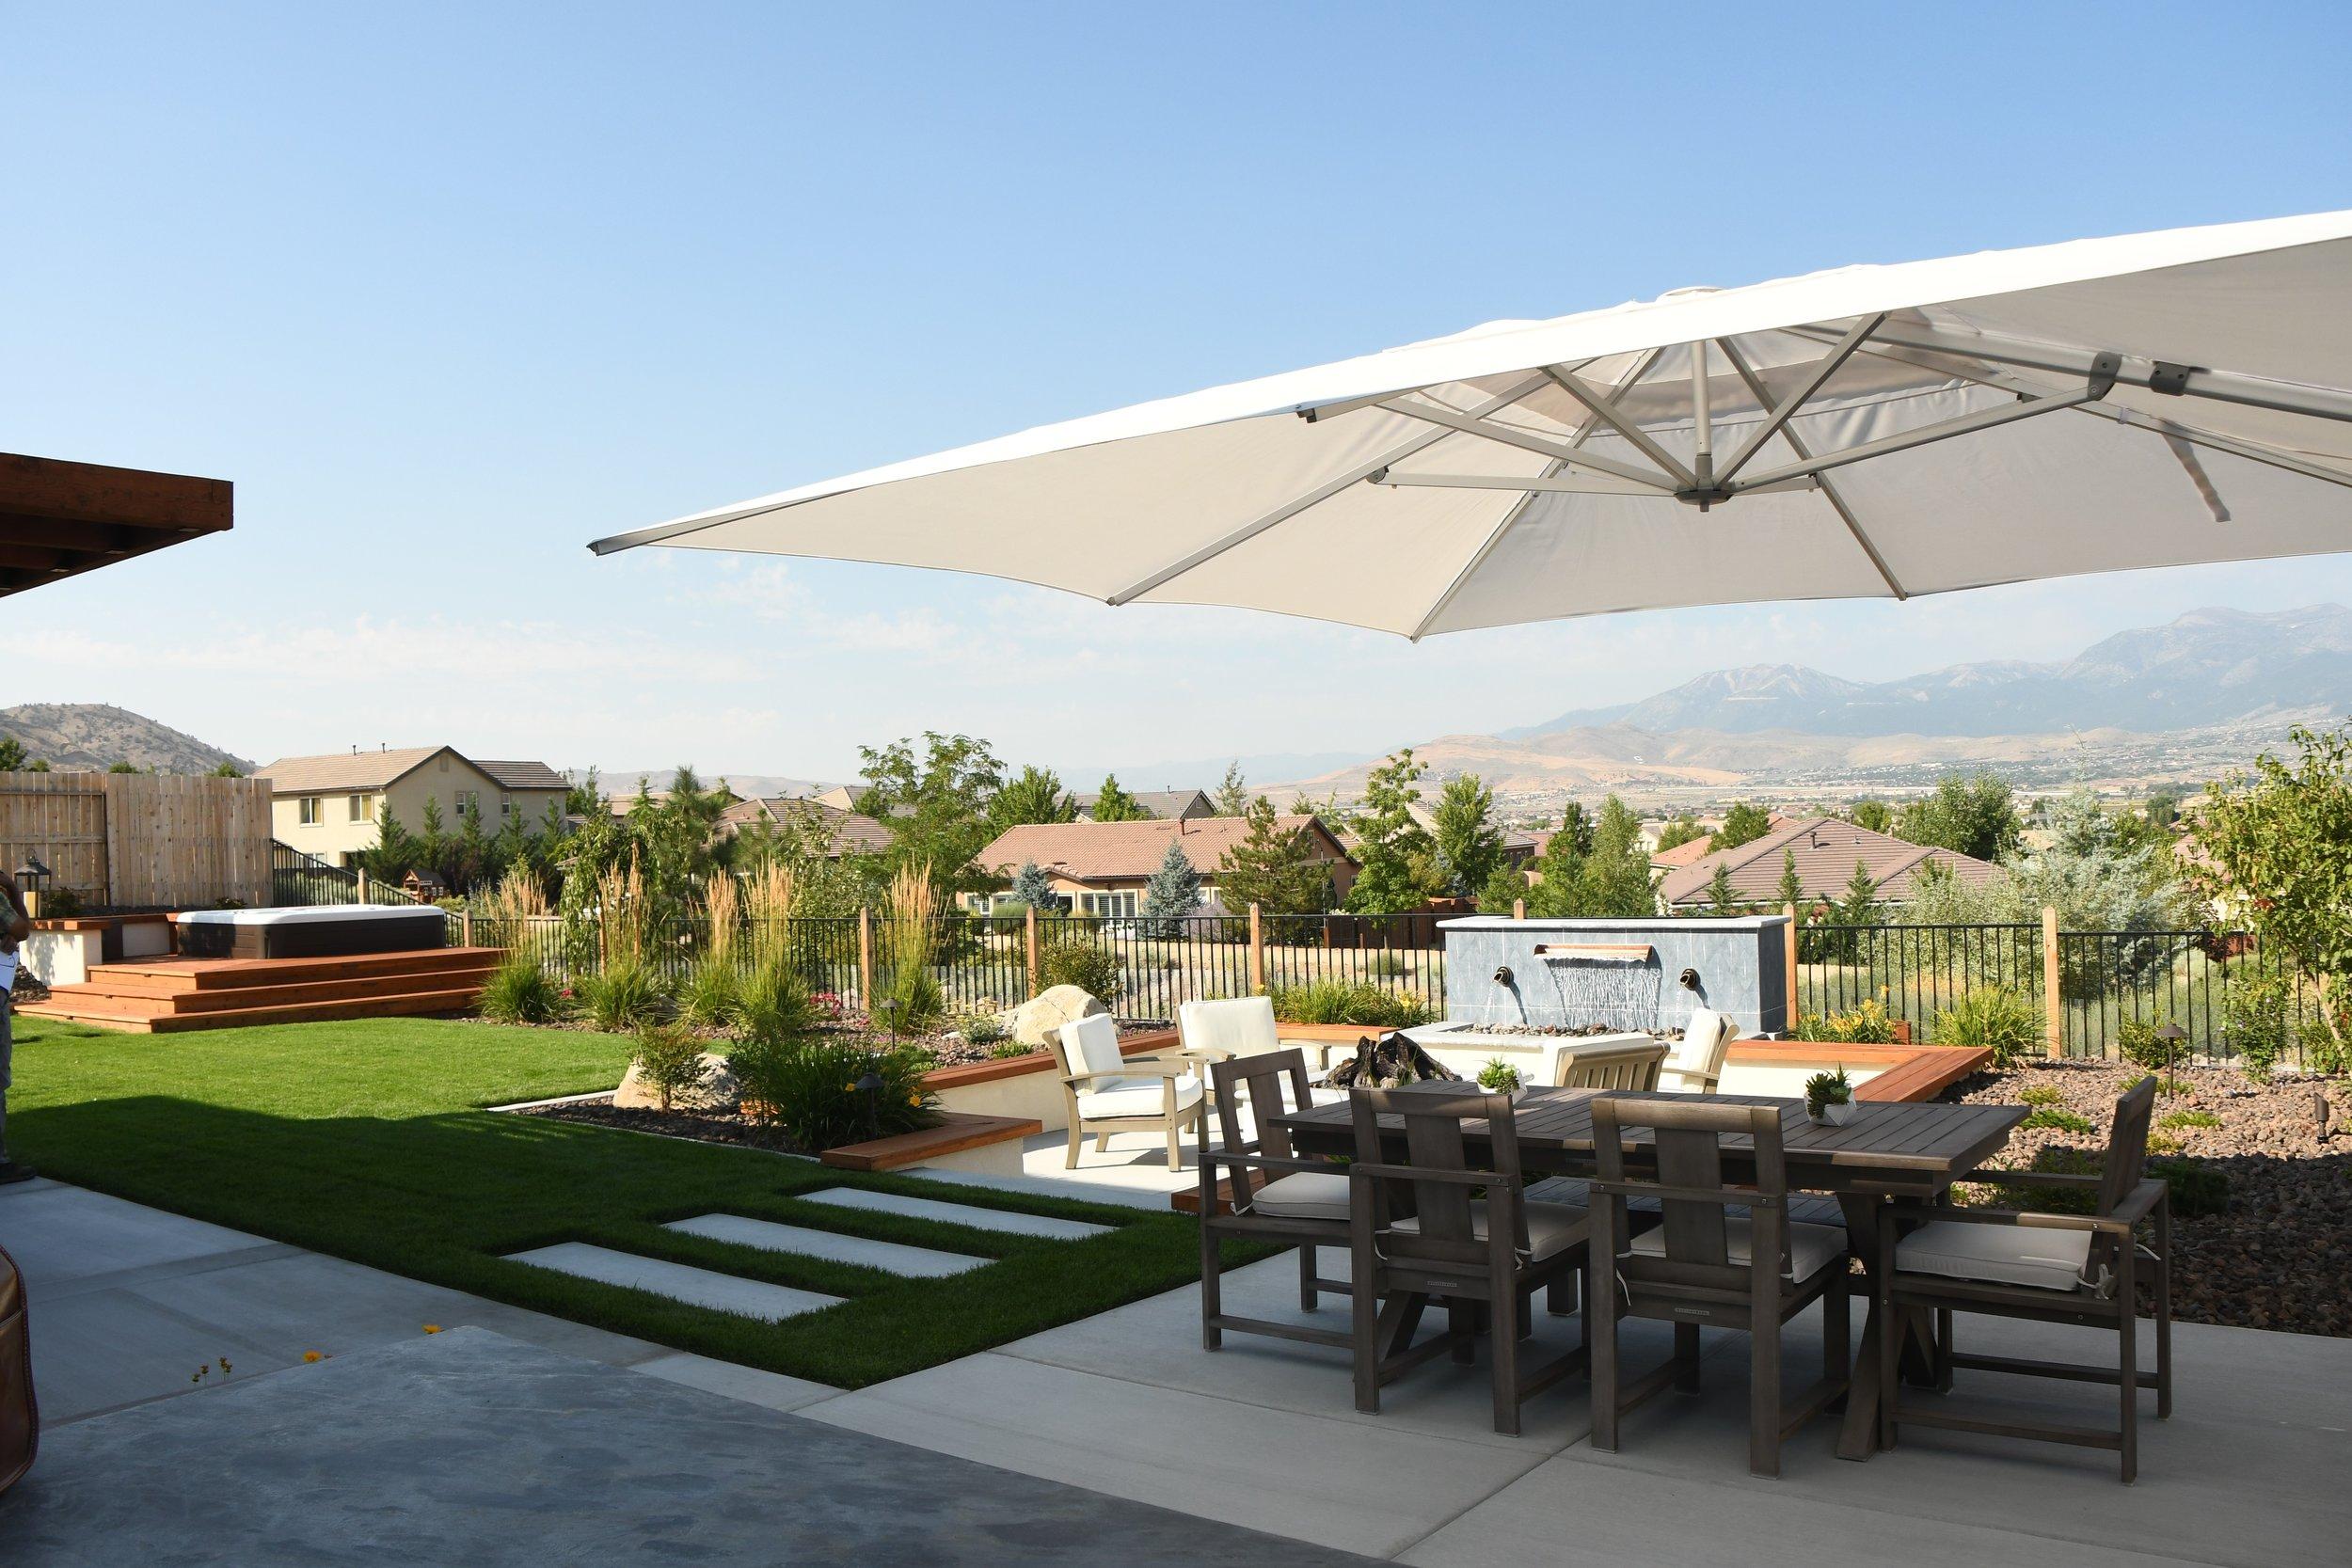 Outdoor Living Kitchen Landscape Architecture Contractors Roseville Ca Firesky Outdoor